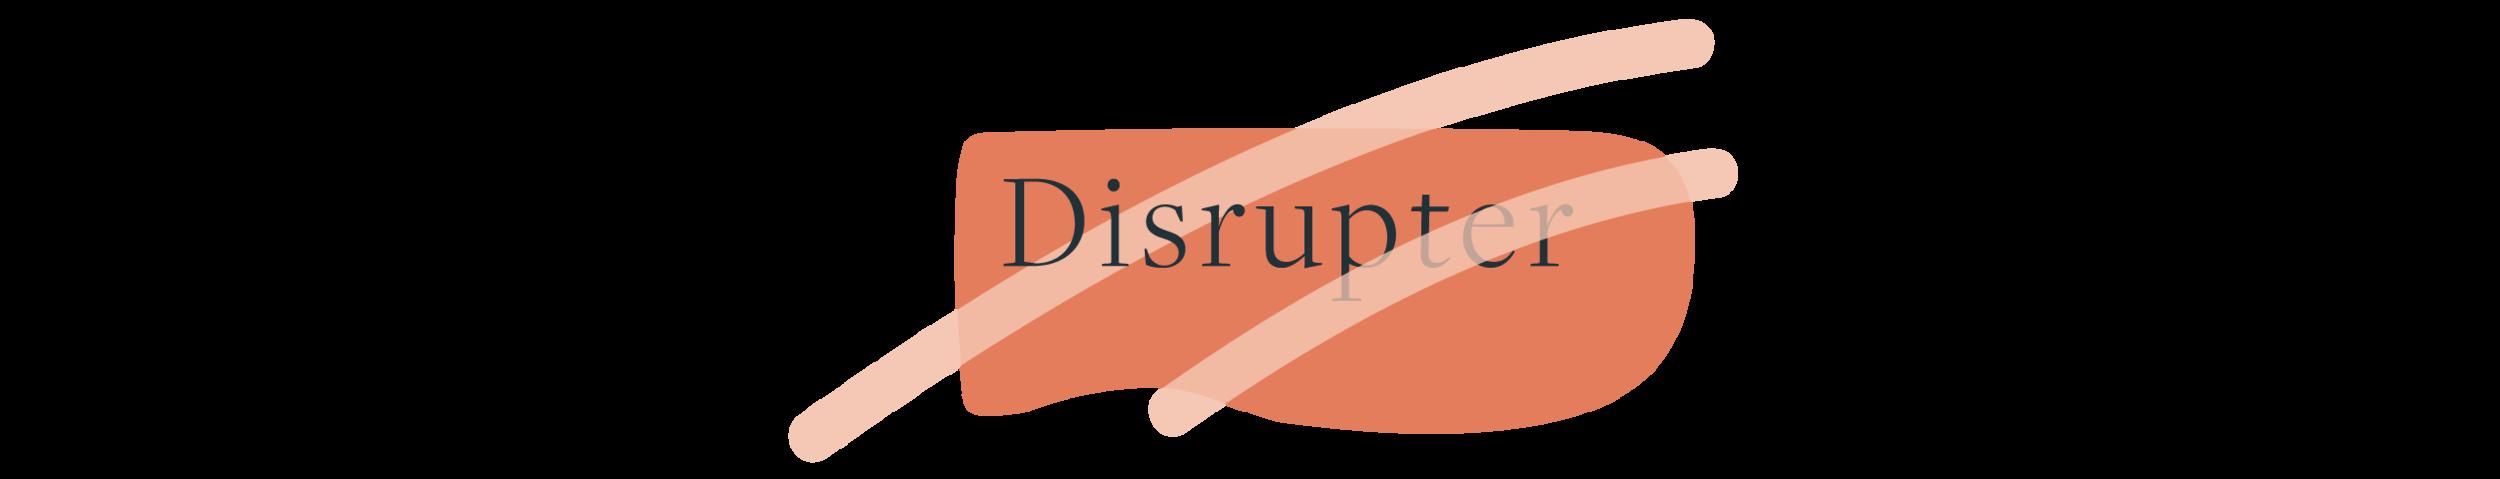 disruptor-02.png